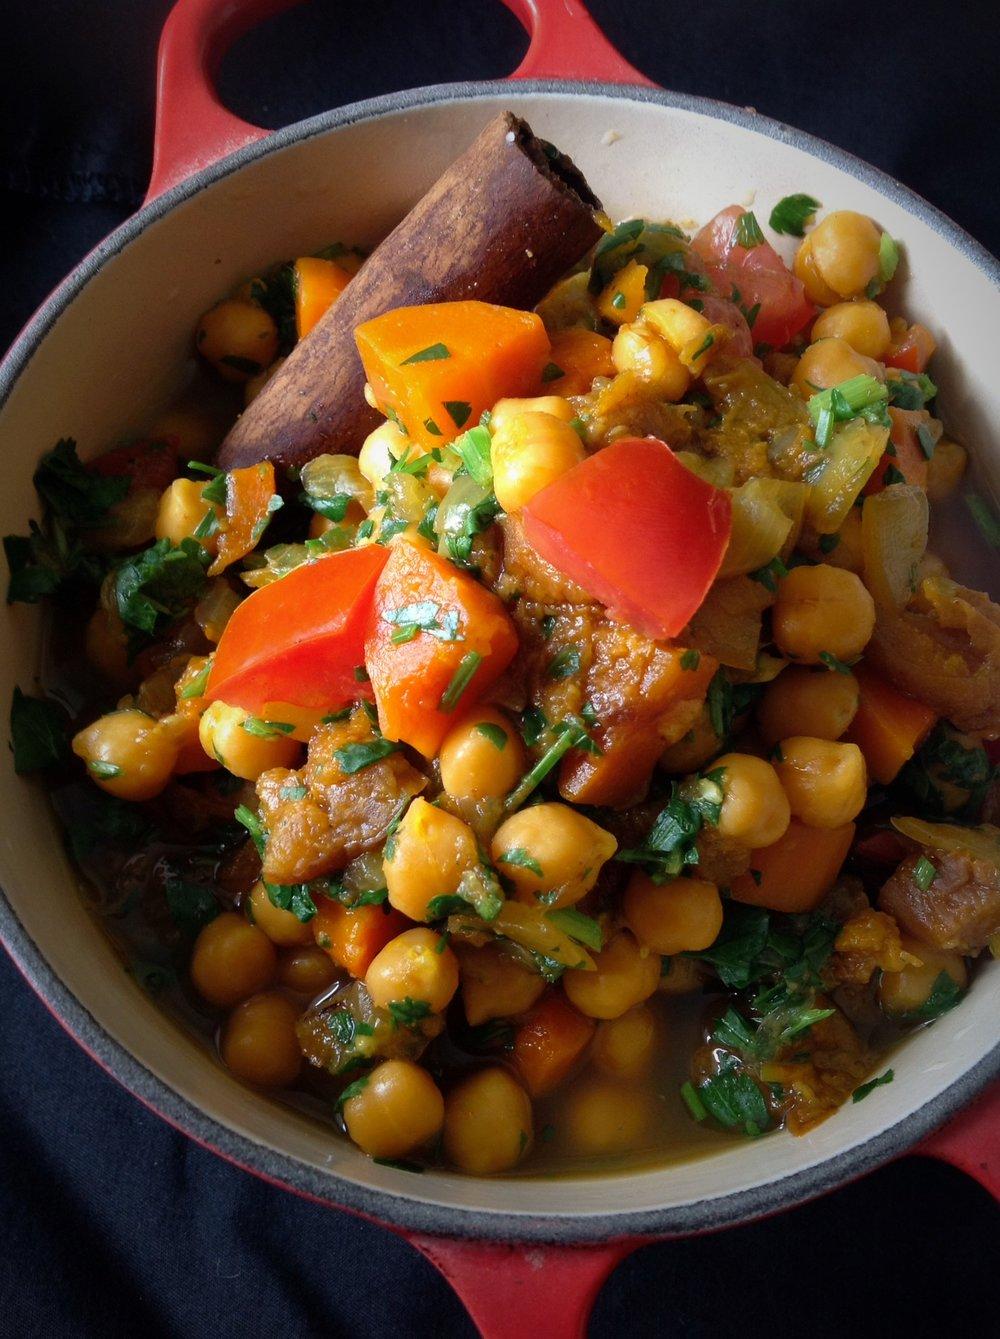 Moroccan Chickpea Tagine Stew - Healthy, Gluten-Free, Vegan Dinner Entree